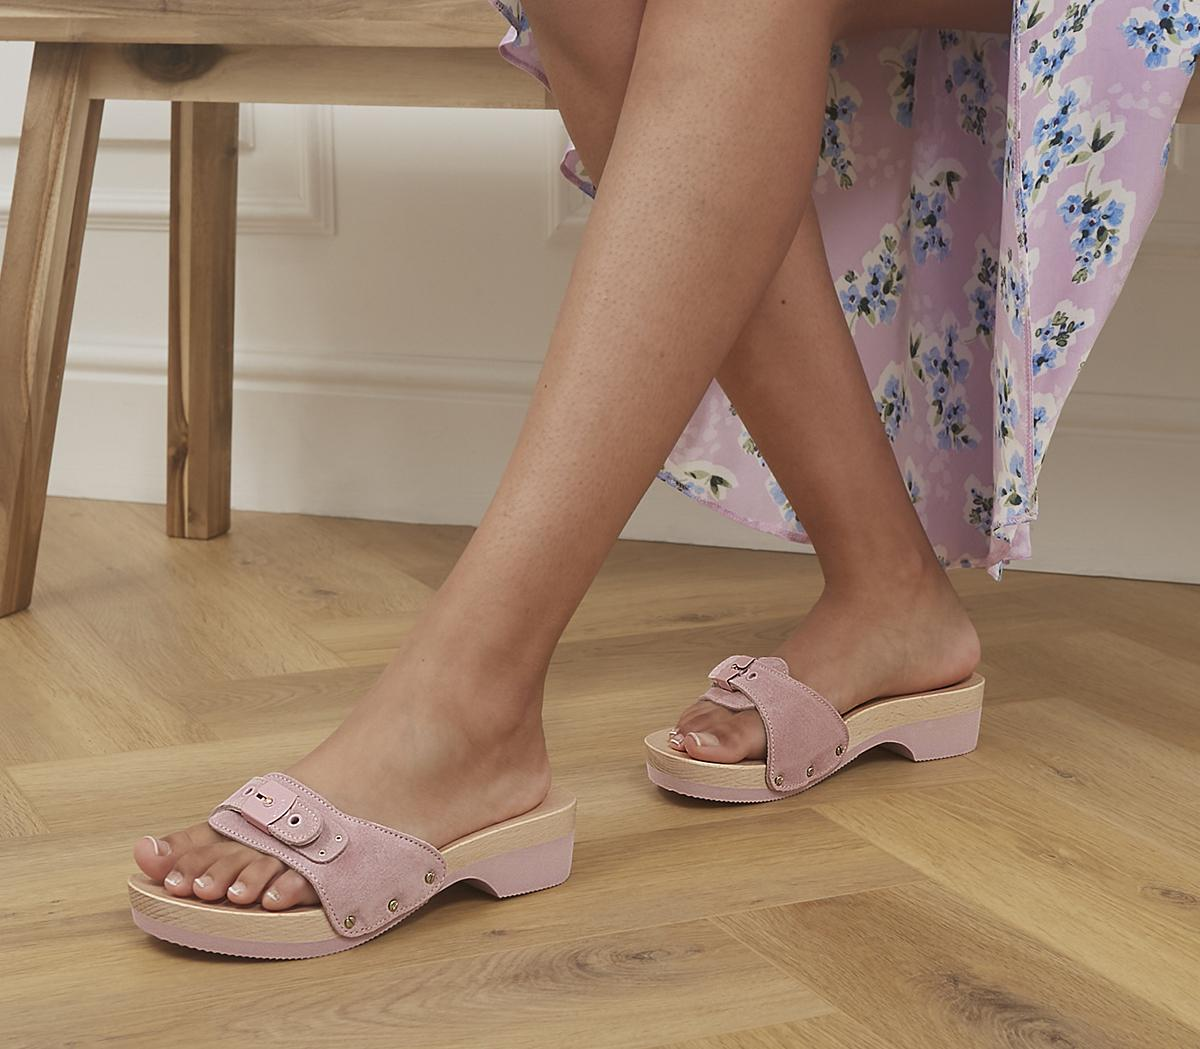 Pescura Heels